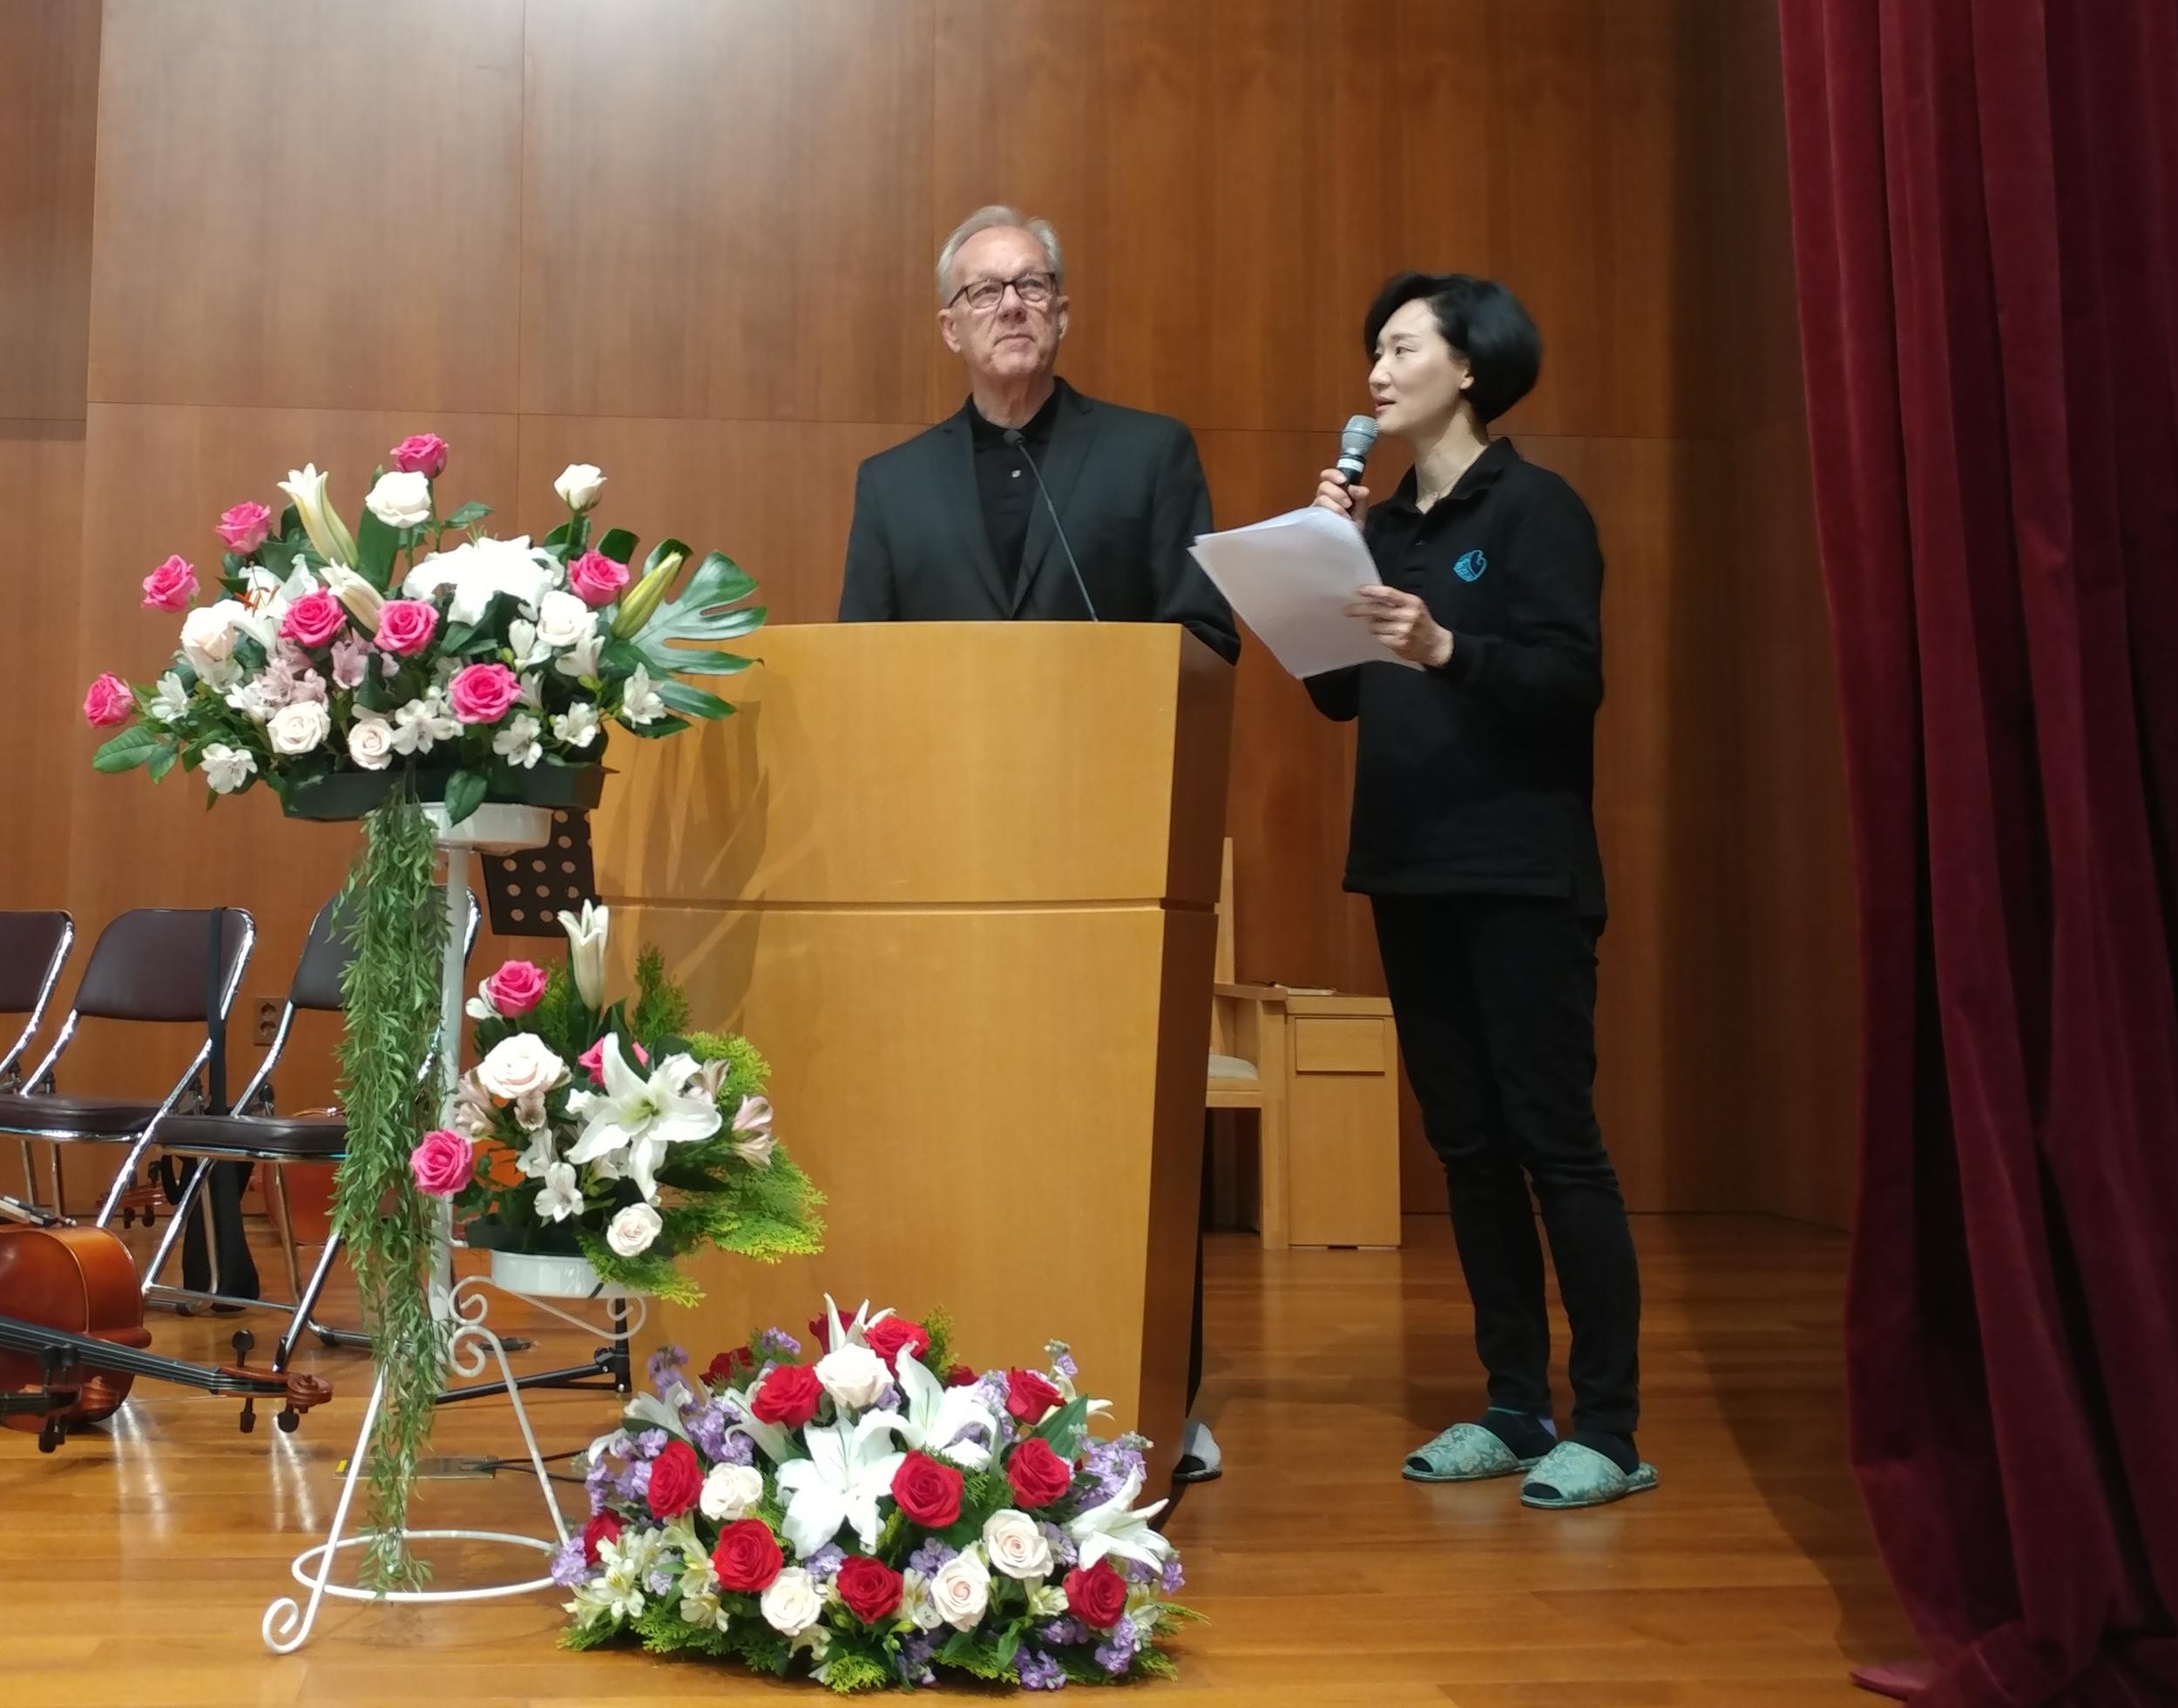 Dr. David Eaton & Yeunhee Chang